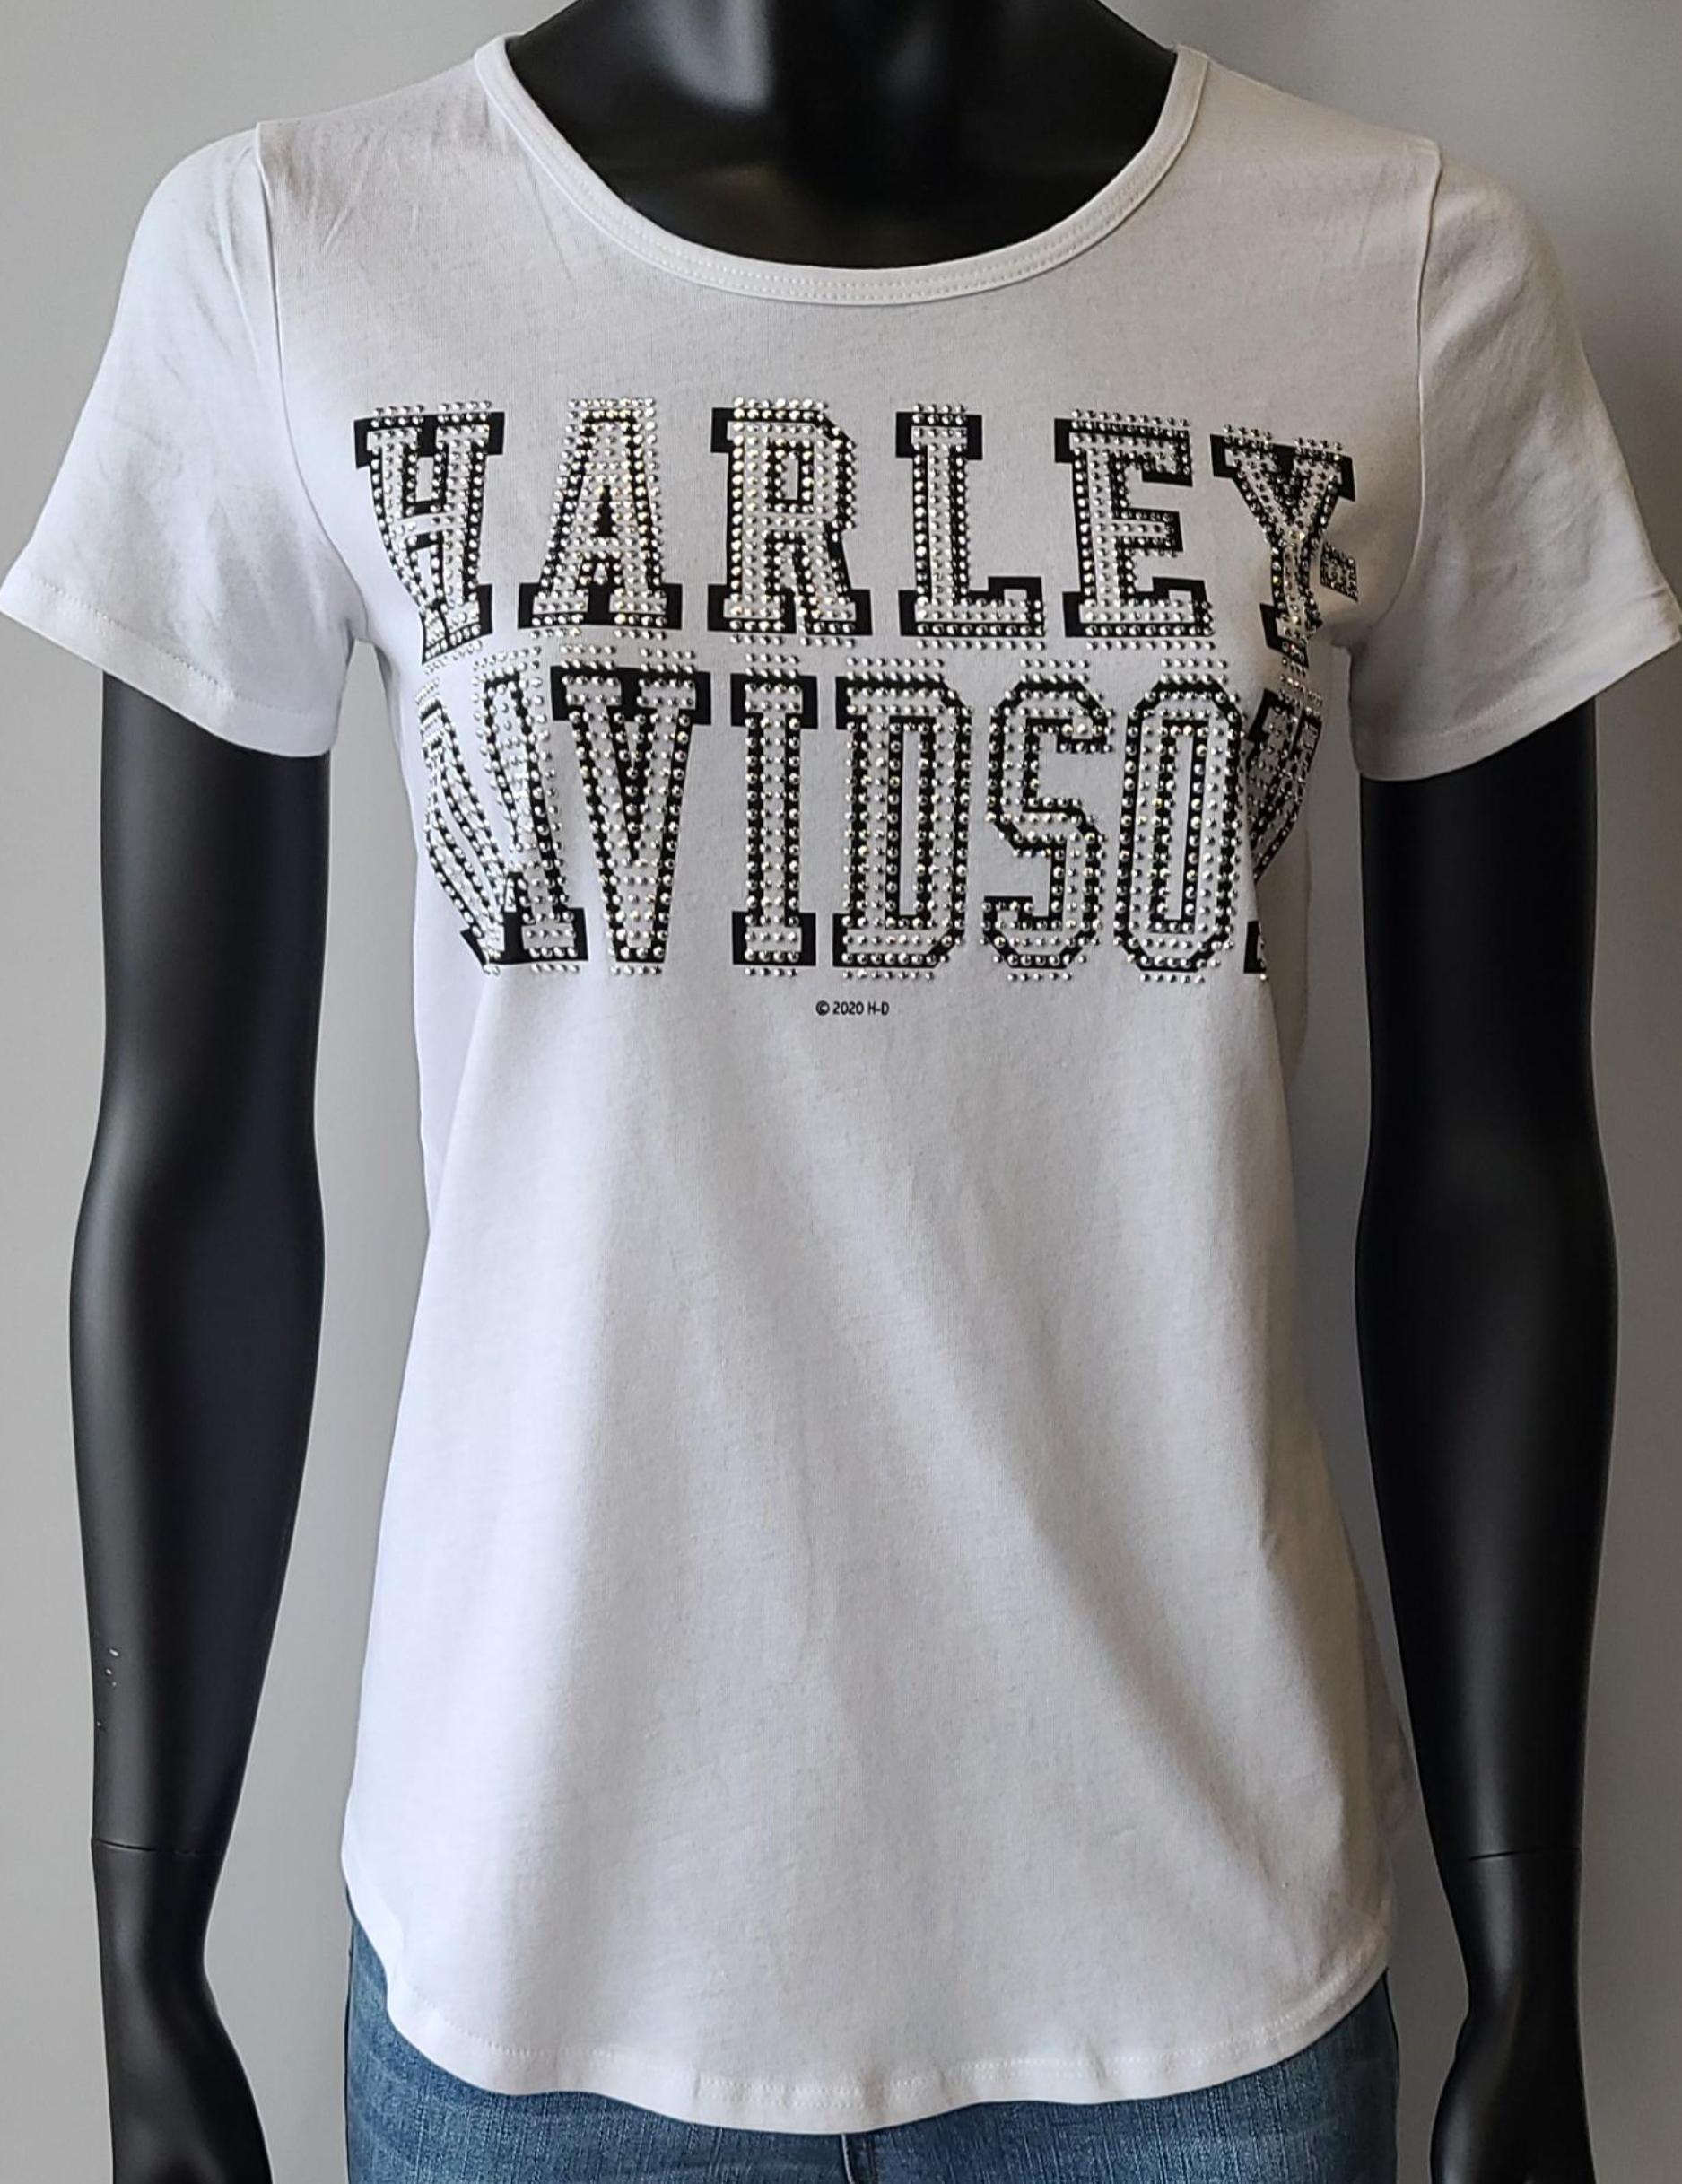 HARLEY DAVIDSON SHIFTY LDS SCOOP WHITE